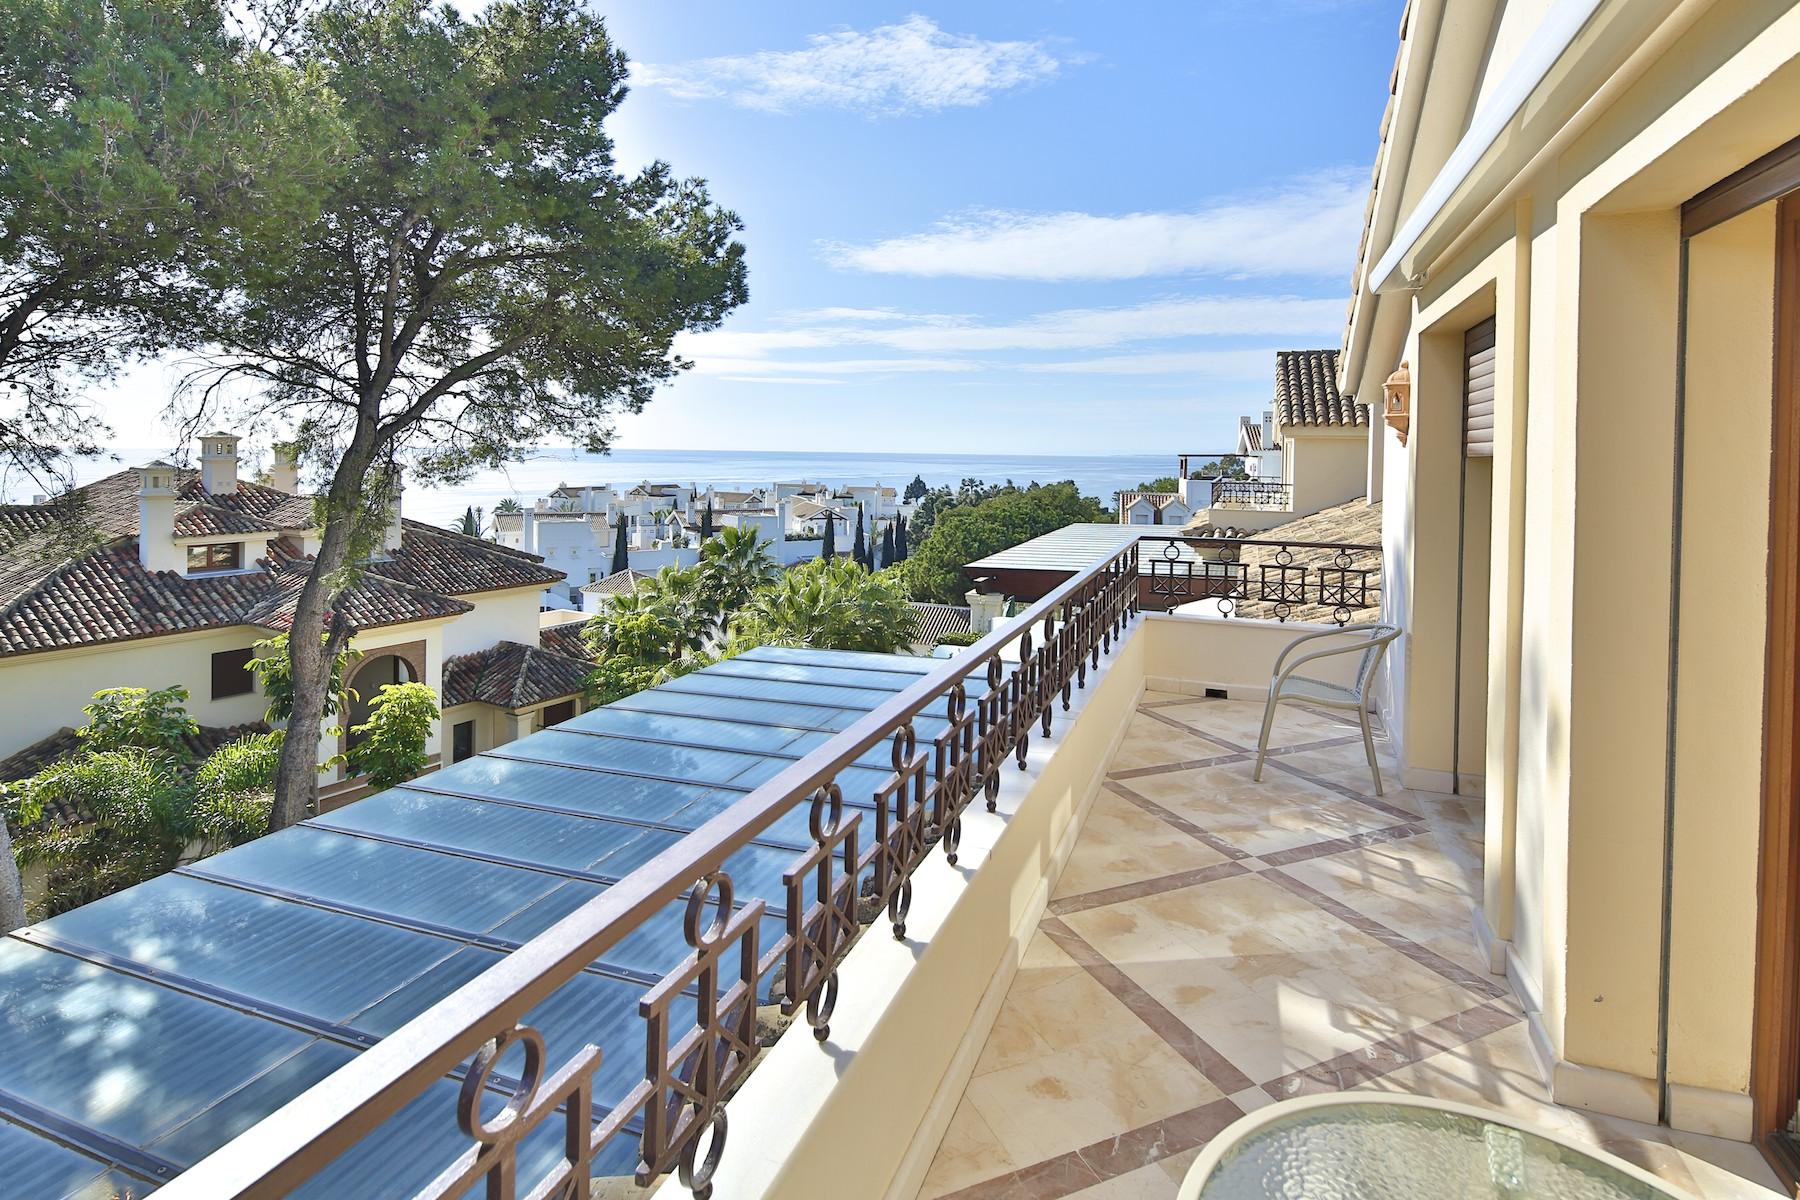 дуплекс для того Продажа на Outstanding luxury duplex penthouse Los Monteros Marbella, Costa Del Sol, 29600 Испания